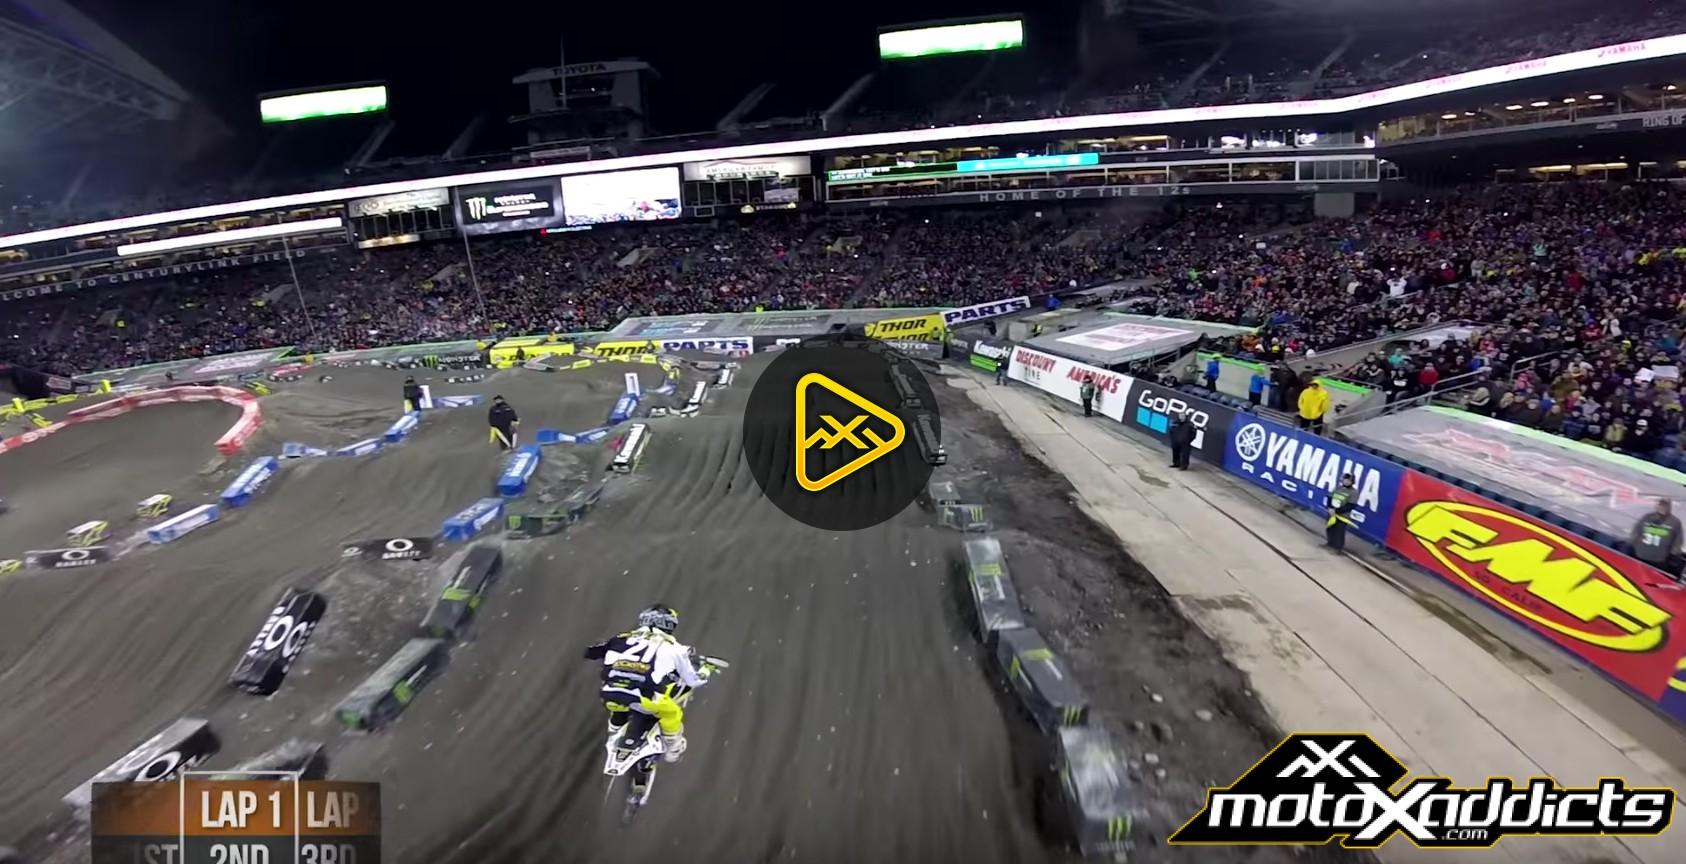 Helmet Cam: Davi Millsaps' Main Event – 2017 Seattle SX